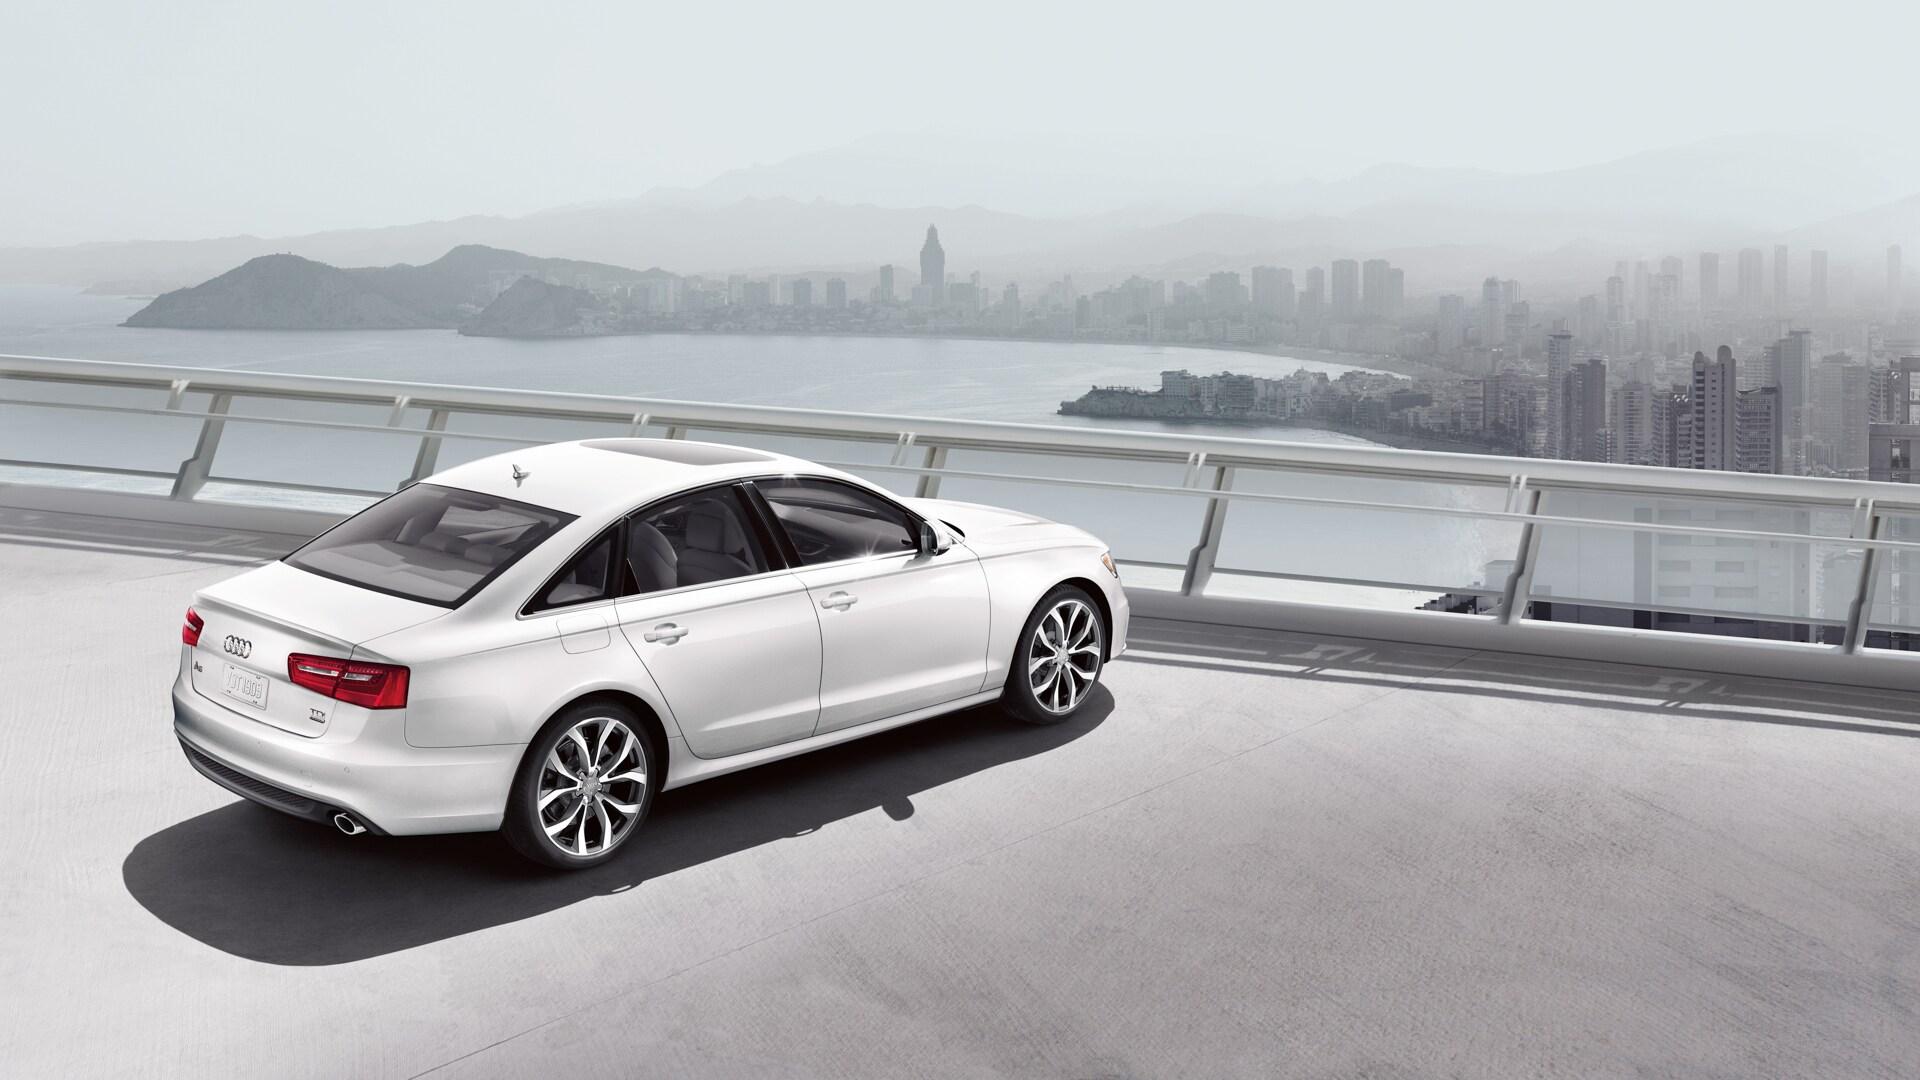 rs cheap car deals with finance audi buyacar header